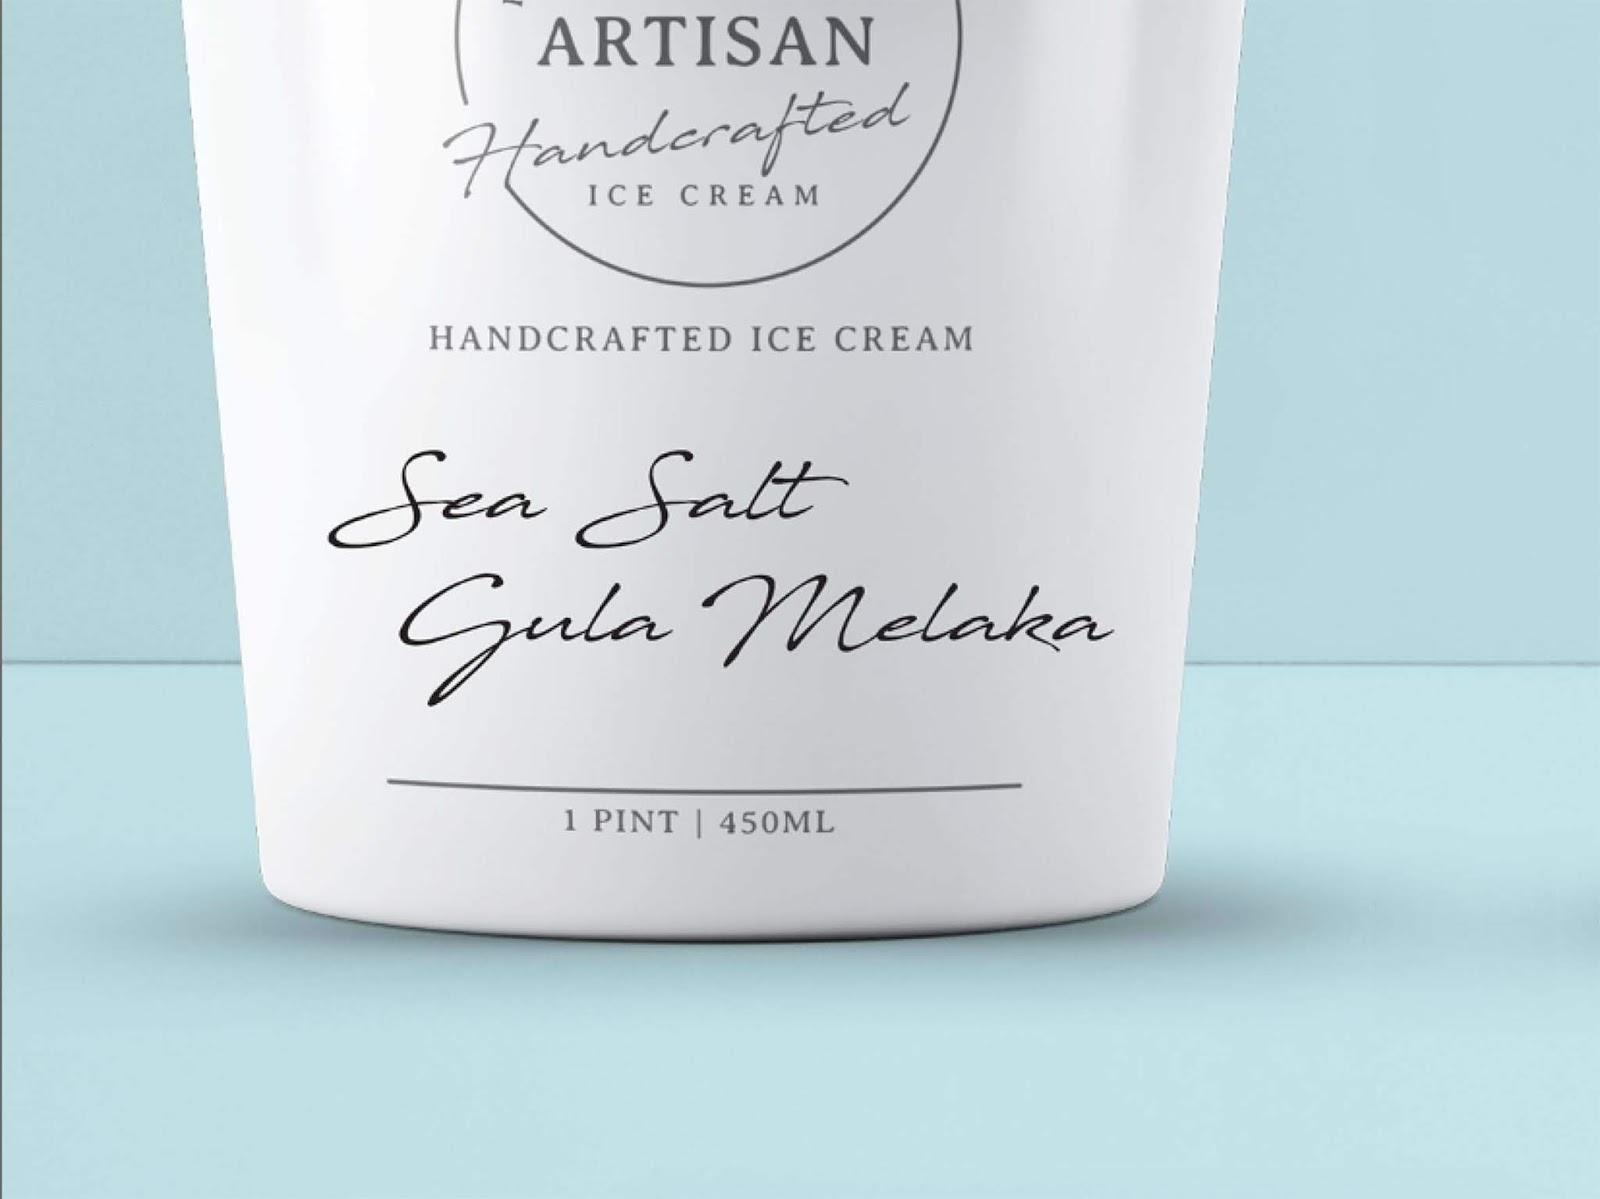 ante_artisan_handcrafted_ice_cream00004.jpg